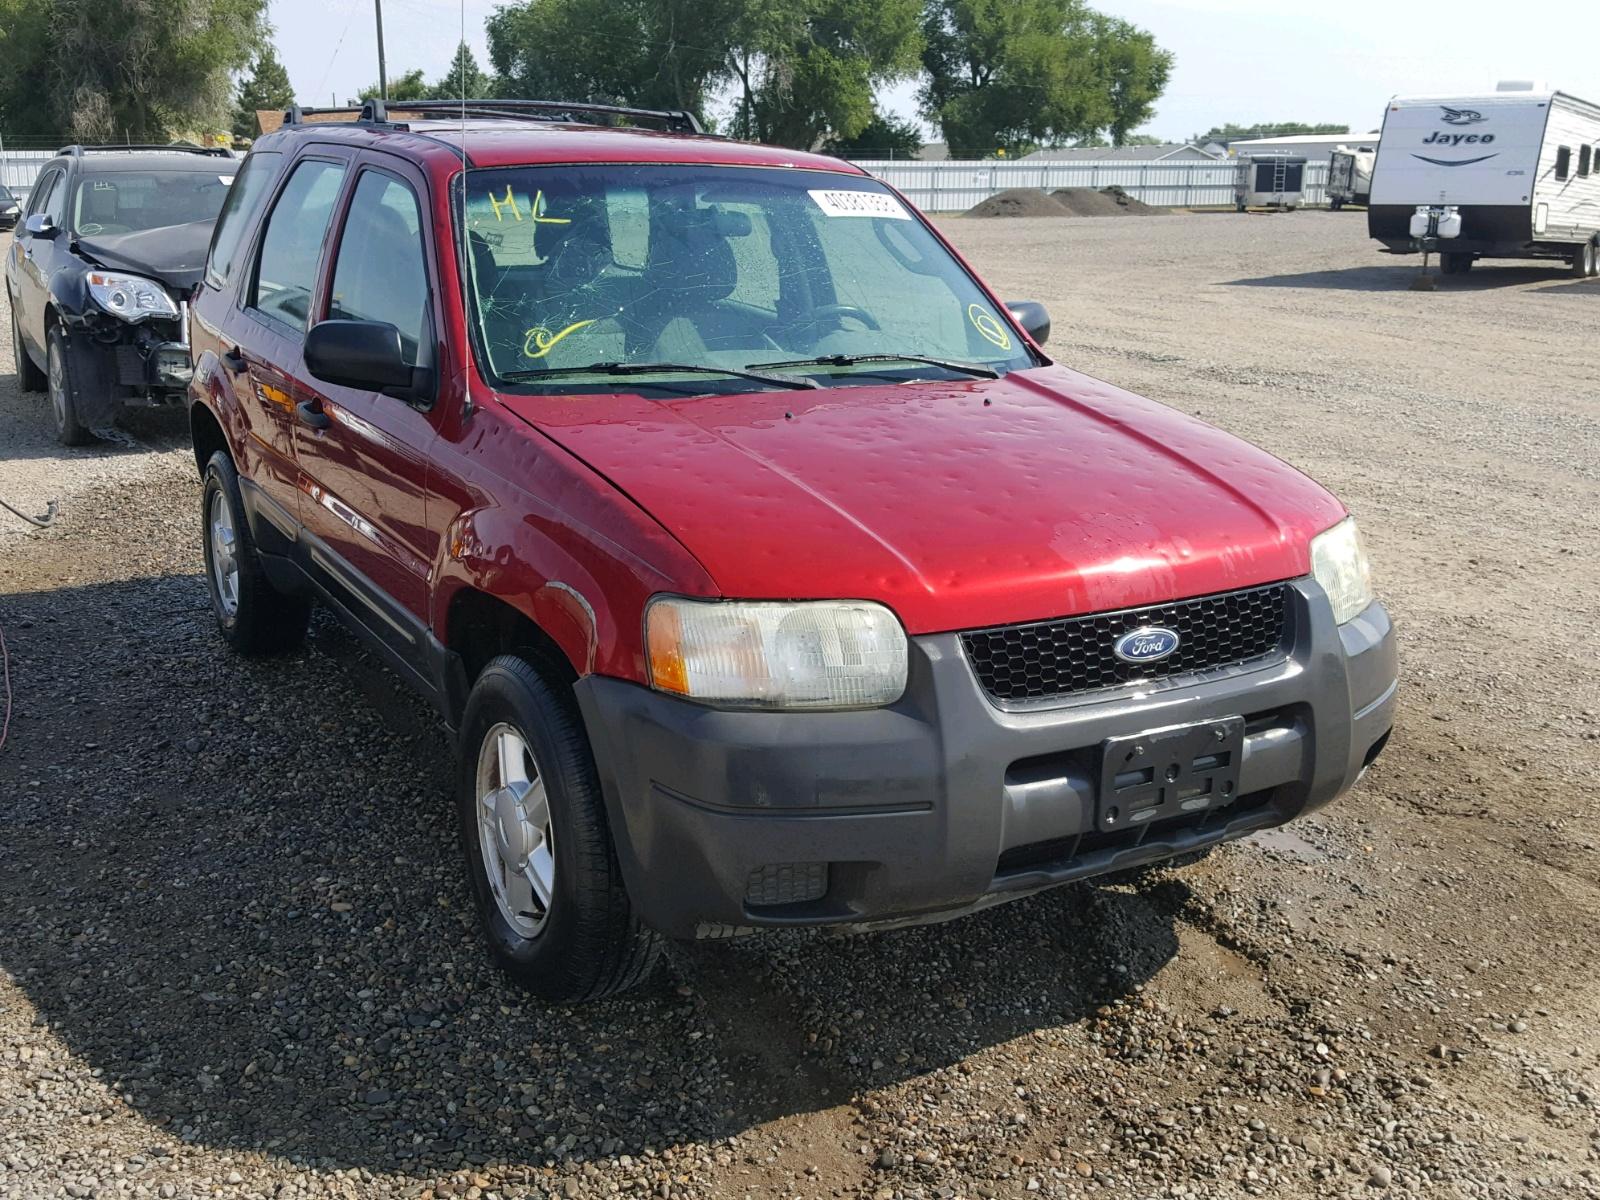 2003 Ford Escape XLS for sale at Copart Billings MT Lot